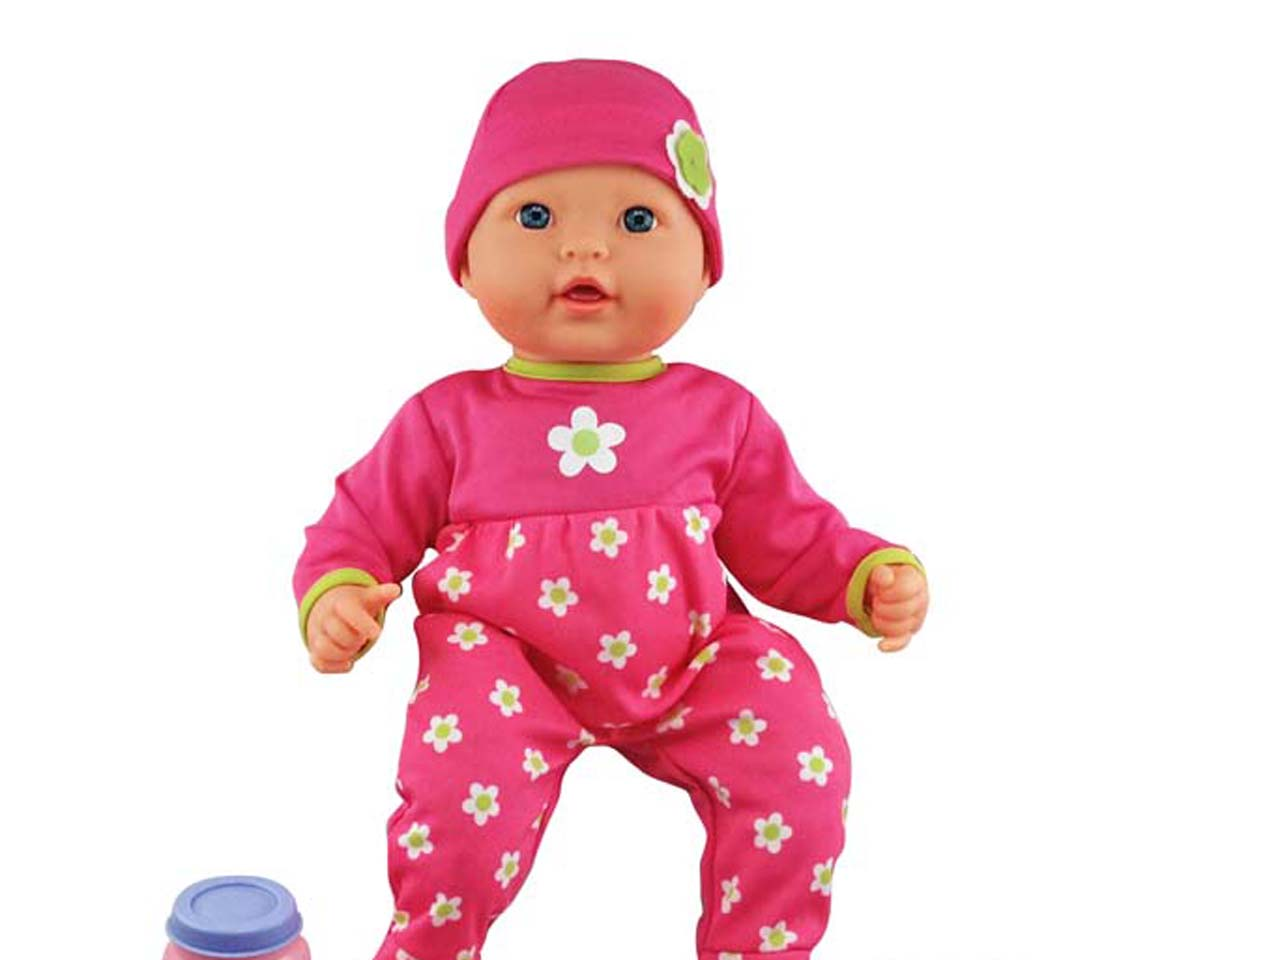 Wal Mart Recalling 174000 Dolls Over Burn Risk To Children Cbs News